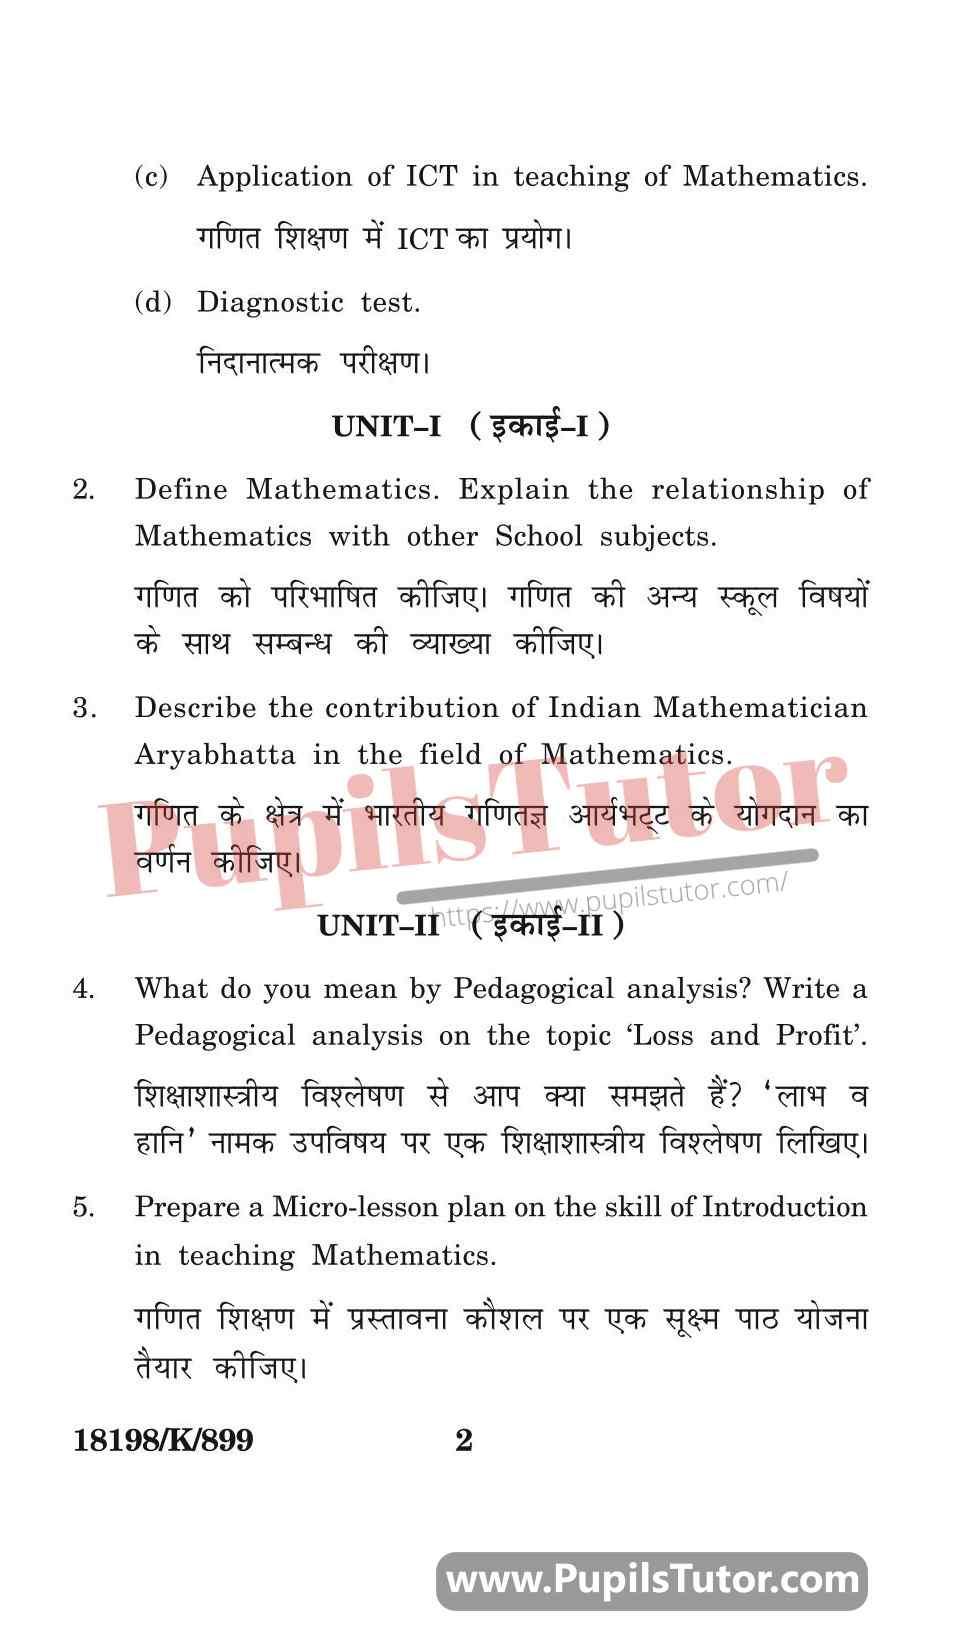 KUK (Kurukshetra University, Haryana) Pedagogy Of Math Question Paper 2020 For B.Ed 1st And 2nd Year And All The 4 Semesters In English And Hindi Medium Free Download PDF